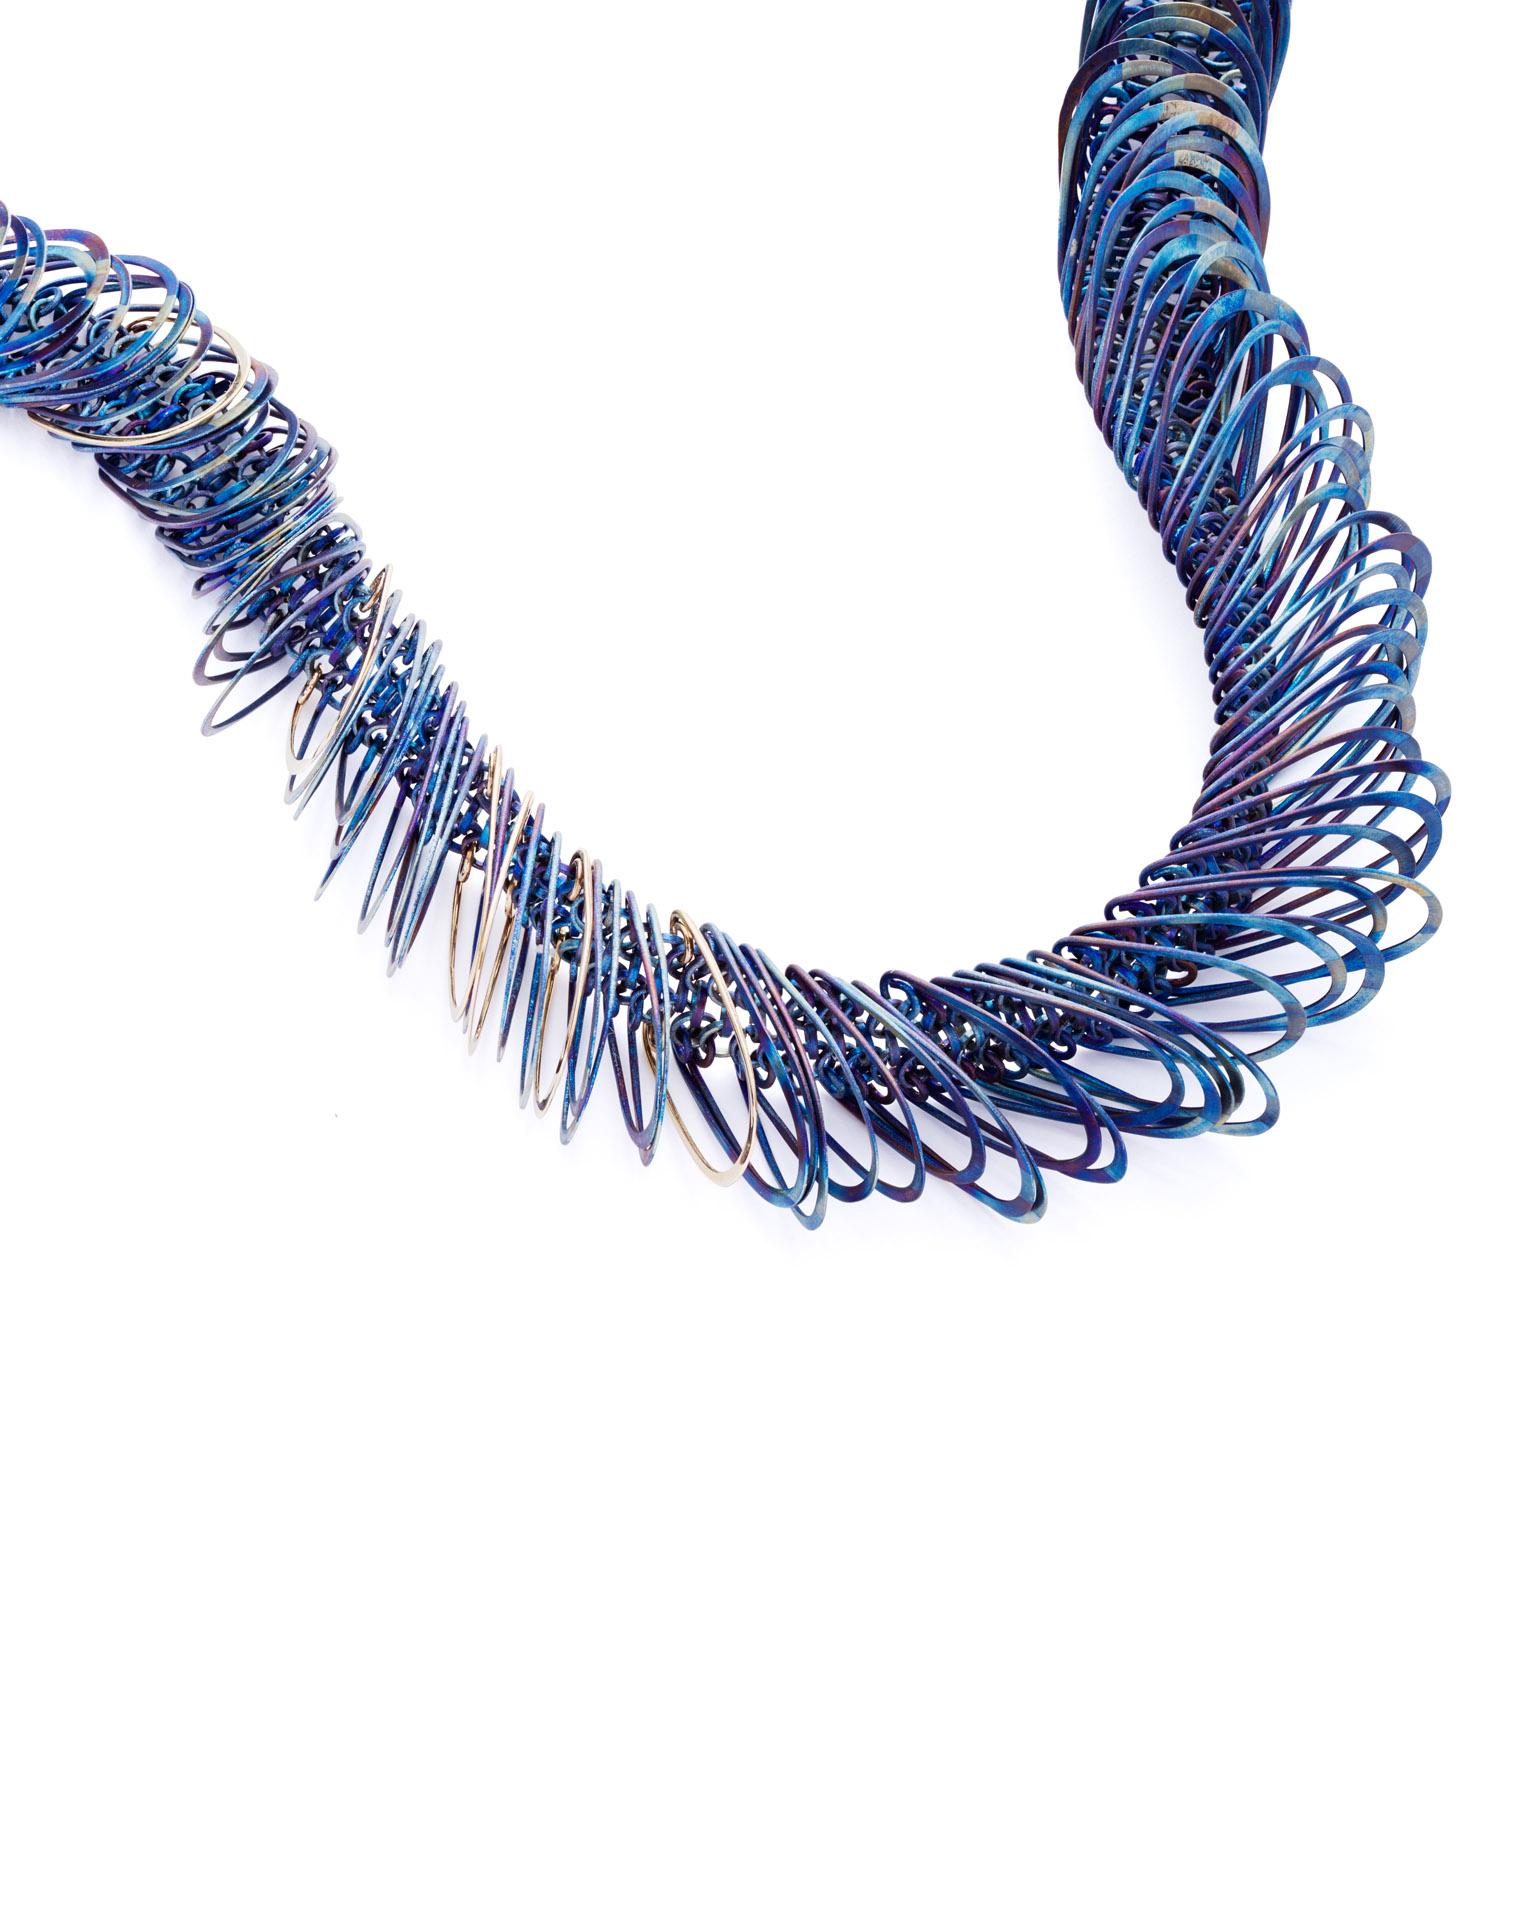 HW3_image2_HWoof_Slinky Necklace_Titanium 9ct gold_rrp£2900.jpg